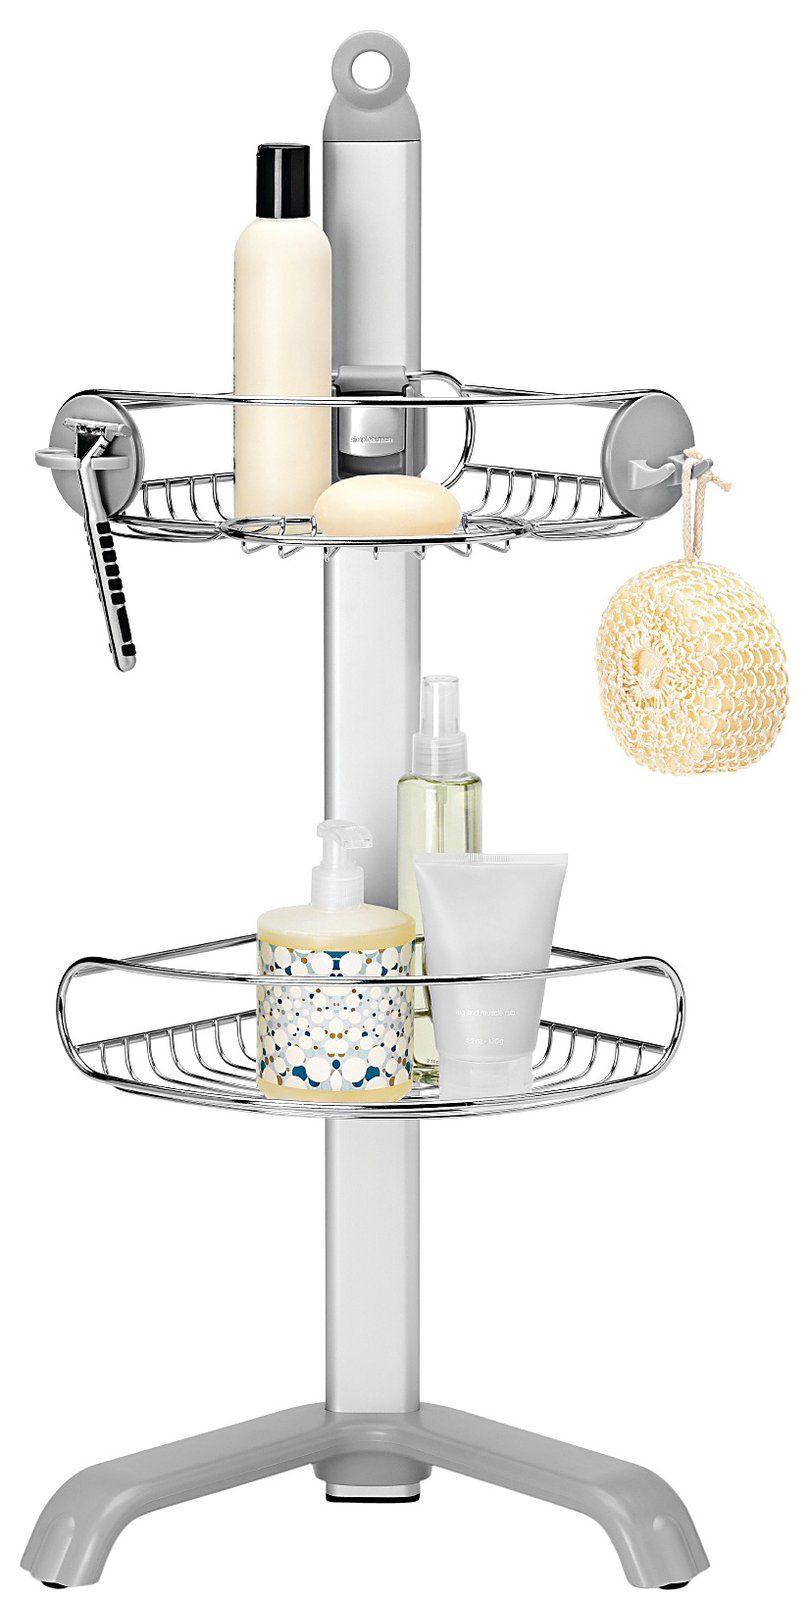 Adjustable Corner Shower Caddy, Stainless Steel - casa.com | Studio ...